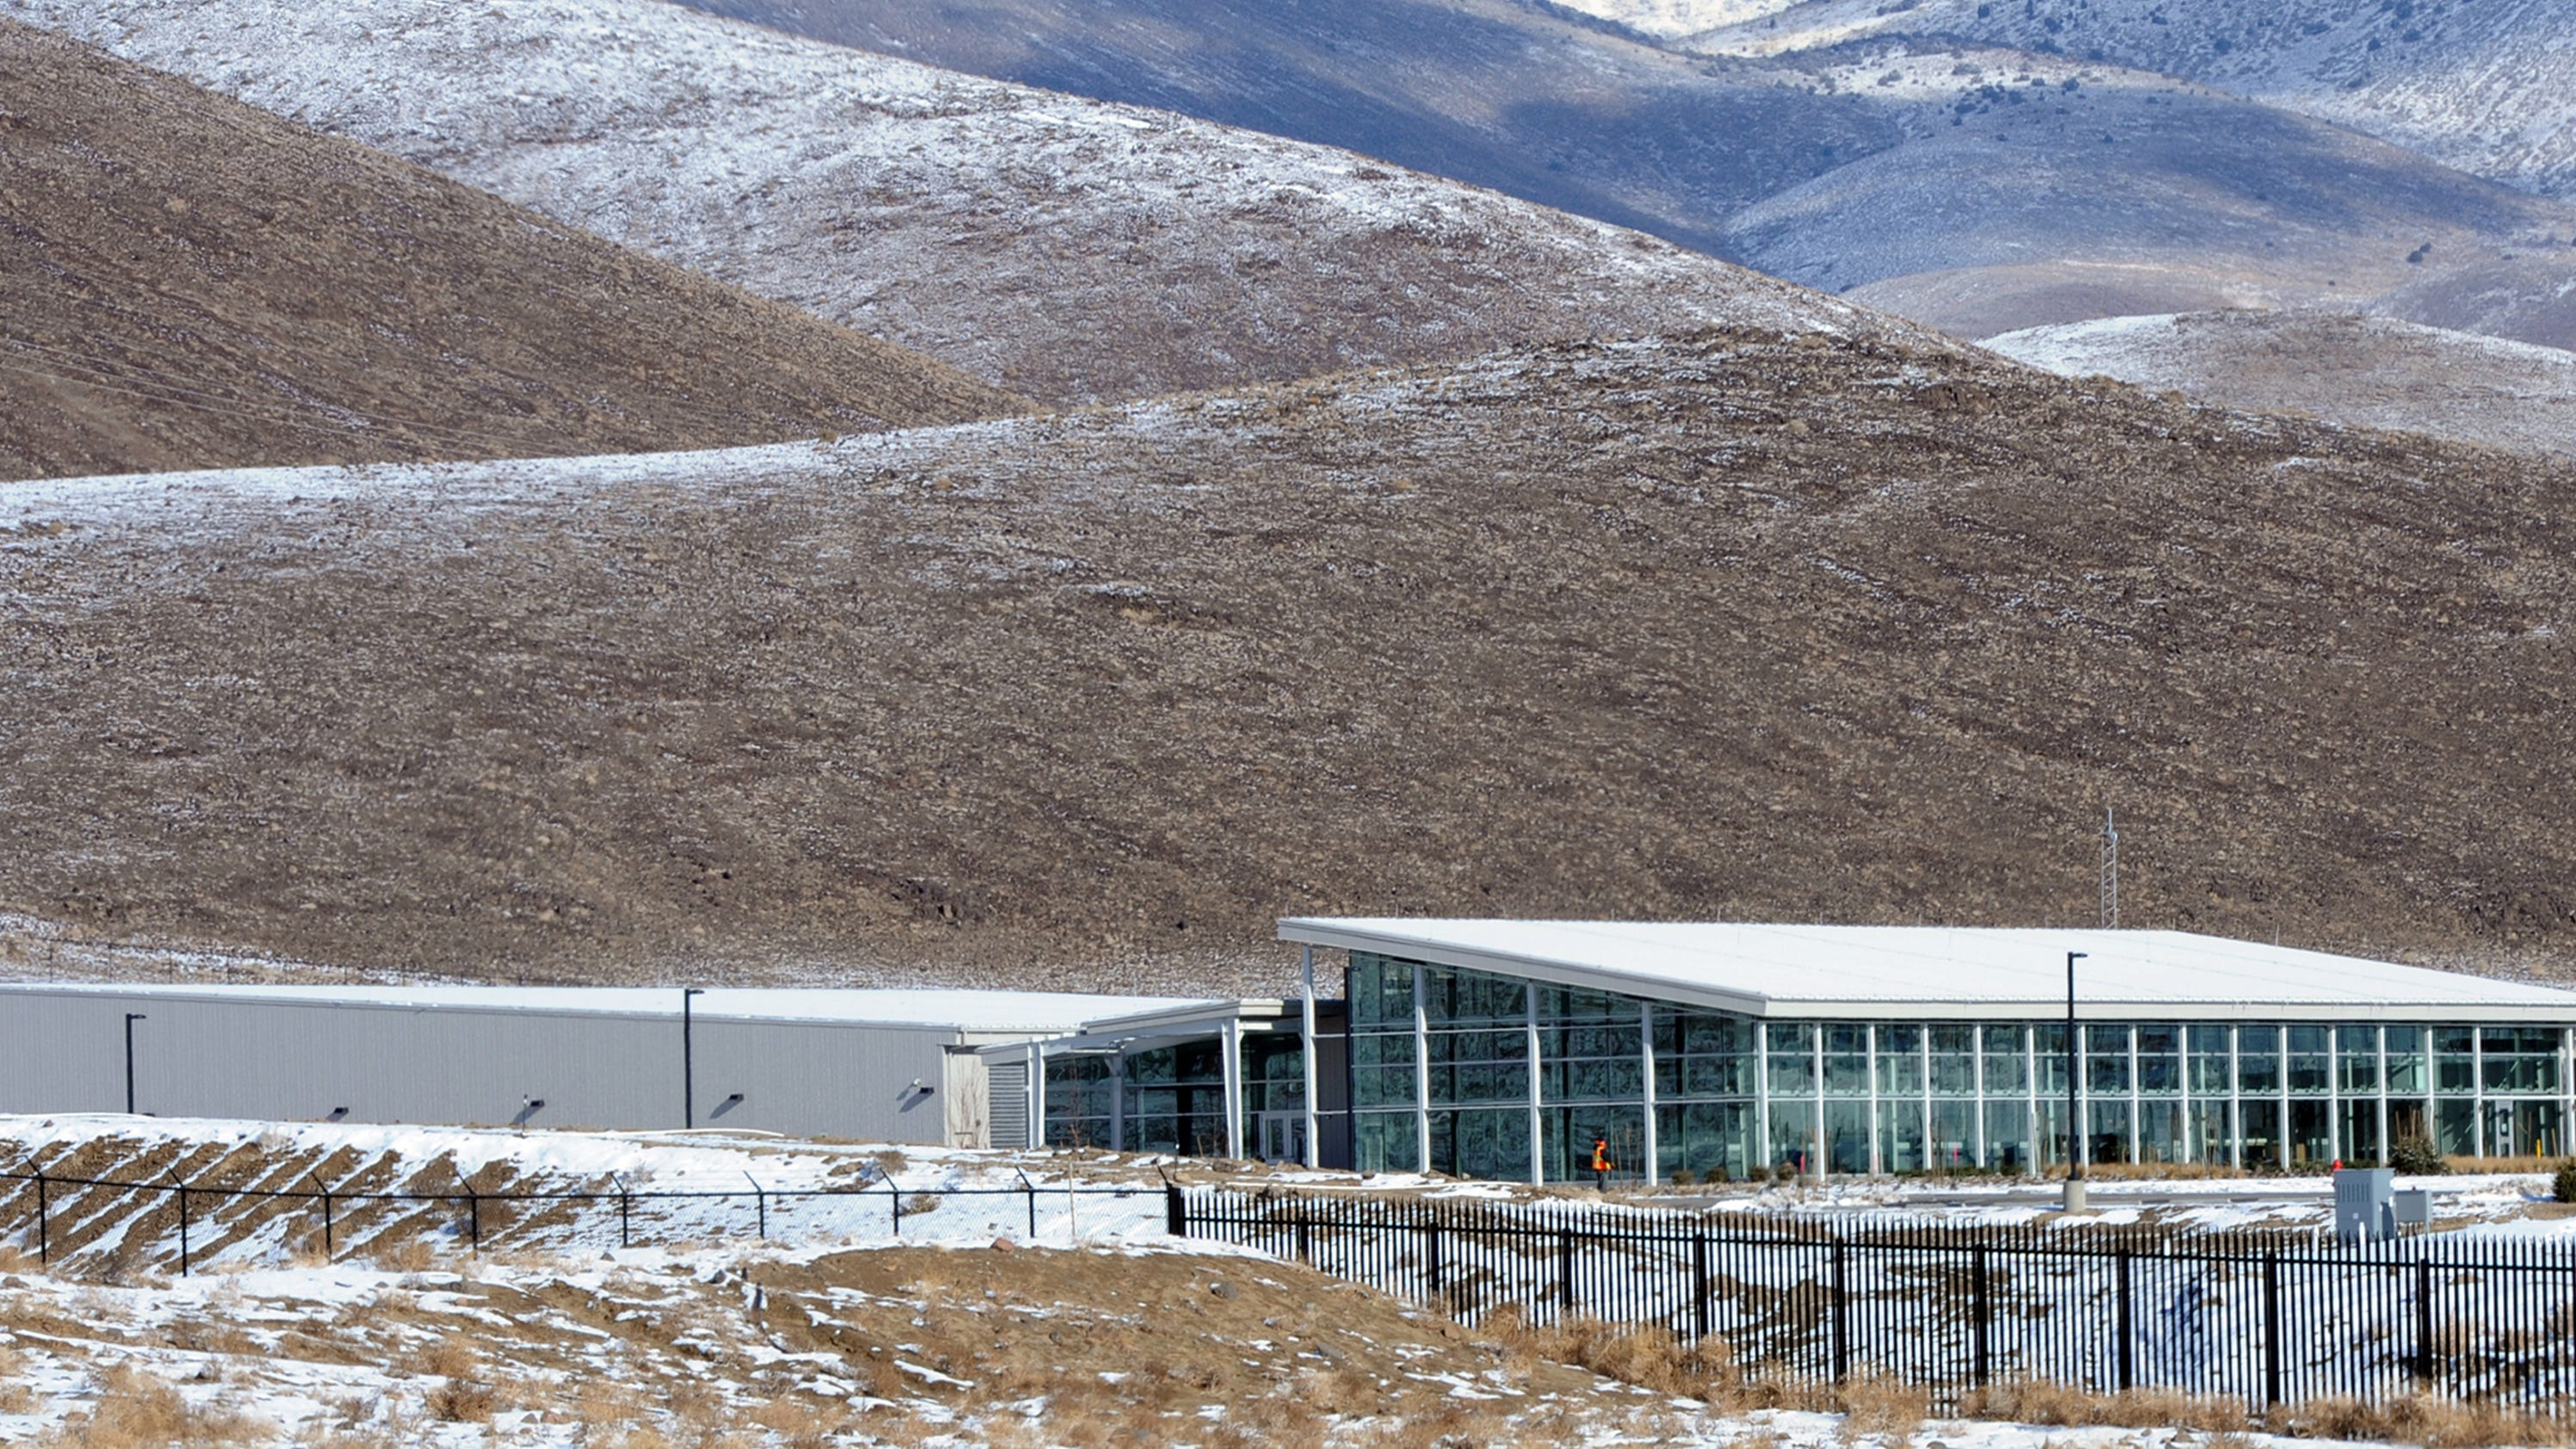 Apple announces 1 billion data center expansion east of reno for Piscine 3 05 x 0 91